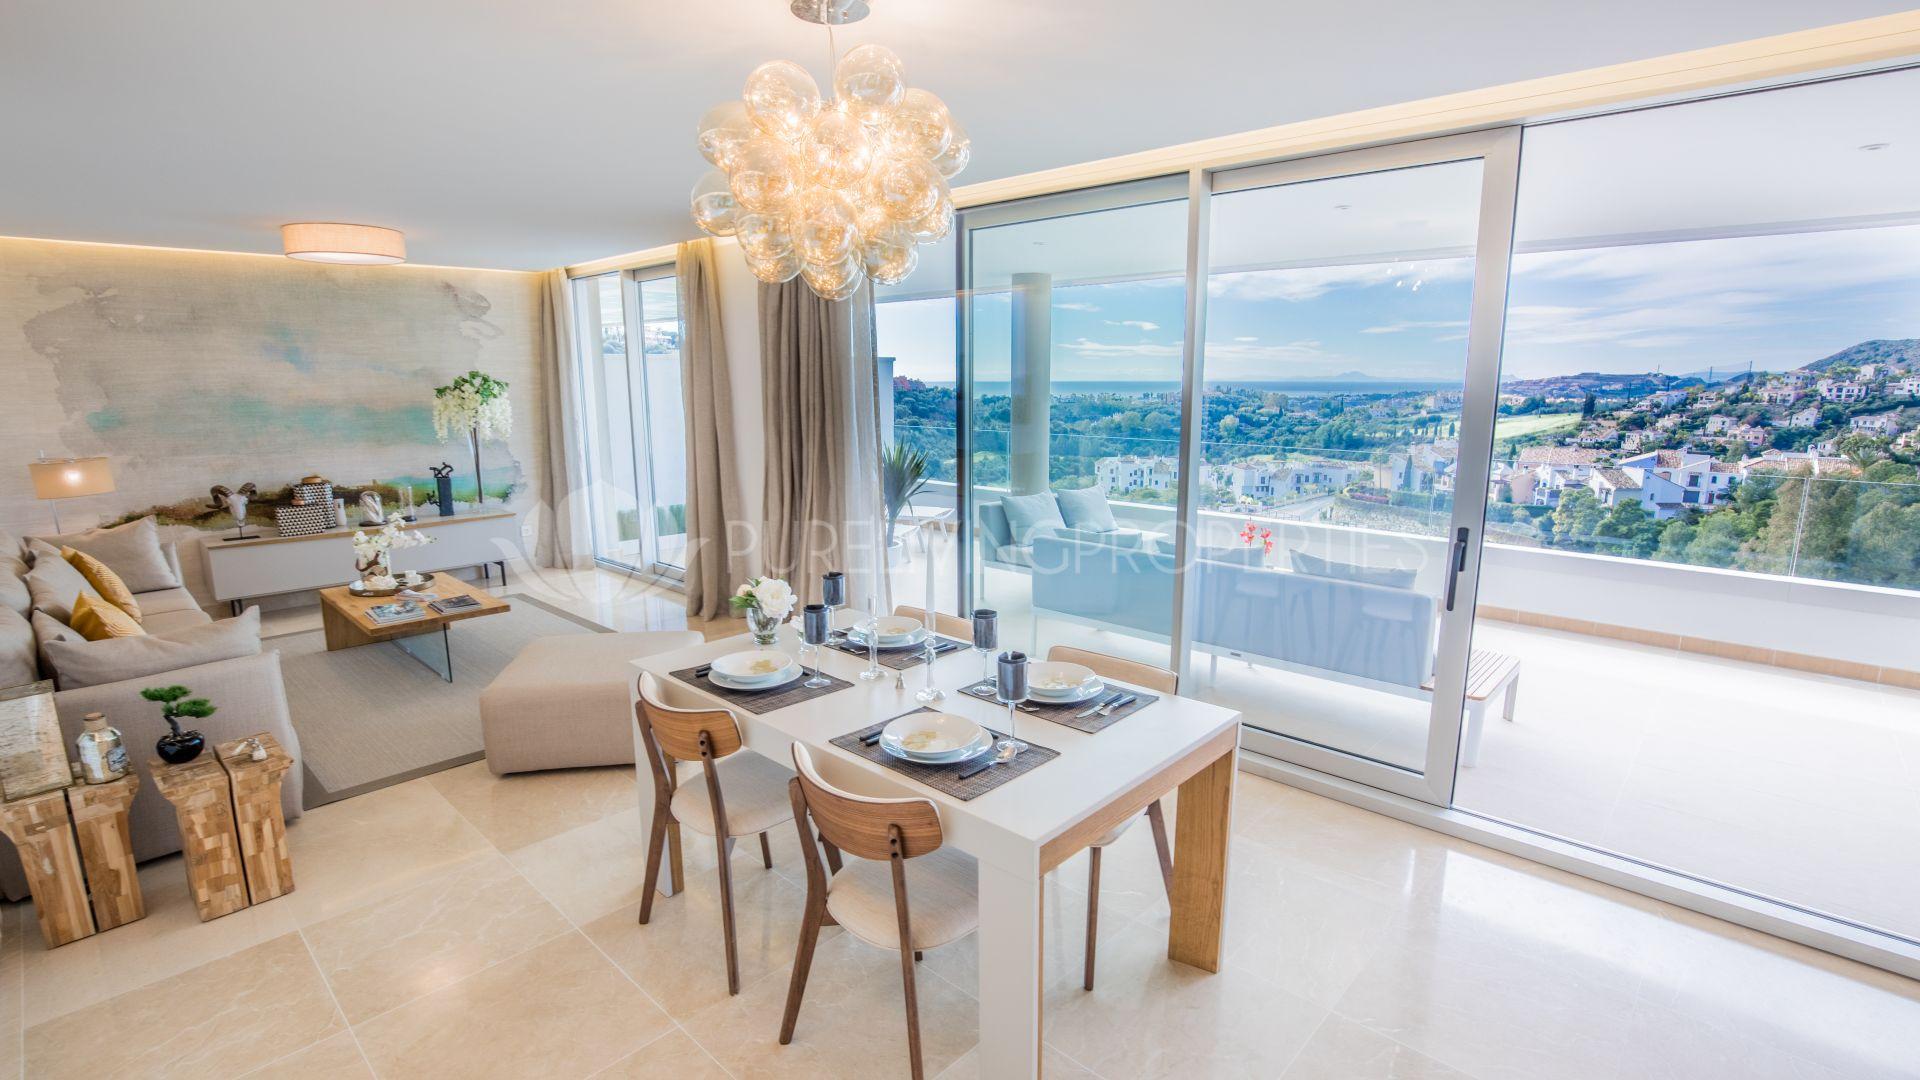 Beautiful Penthouse Apartment In La Reserva De Alcuzcuz Benahavis